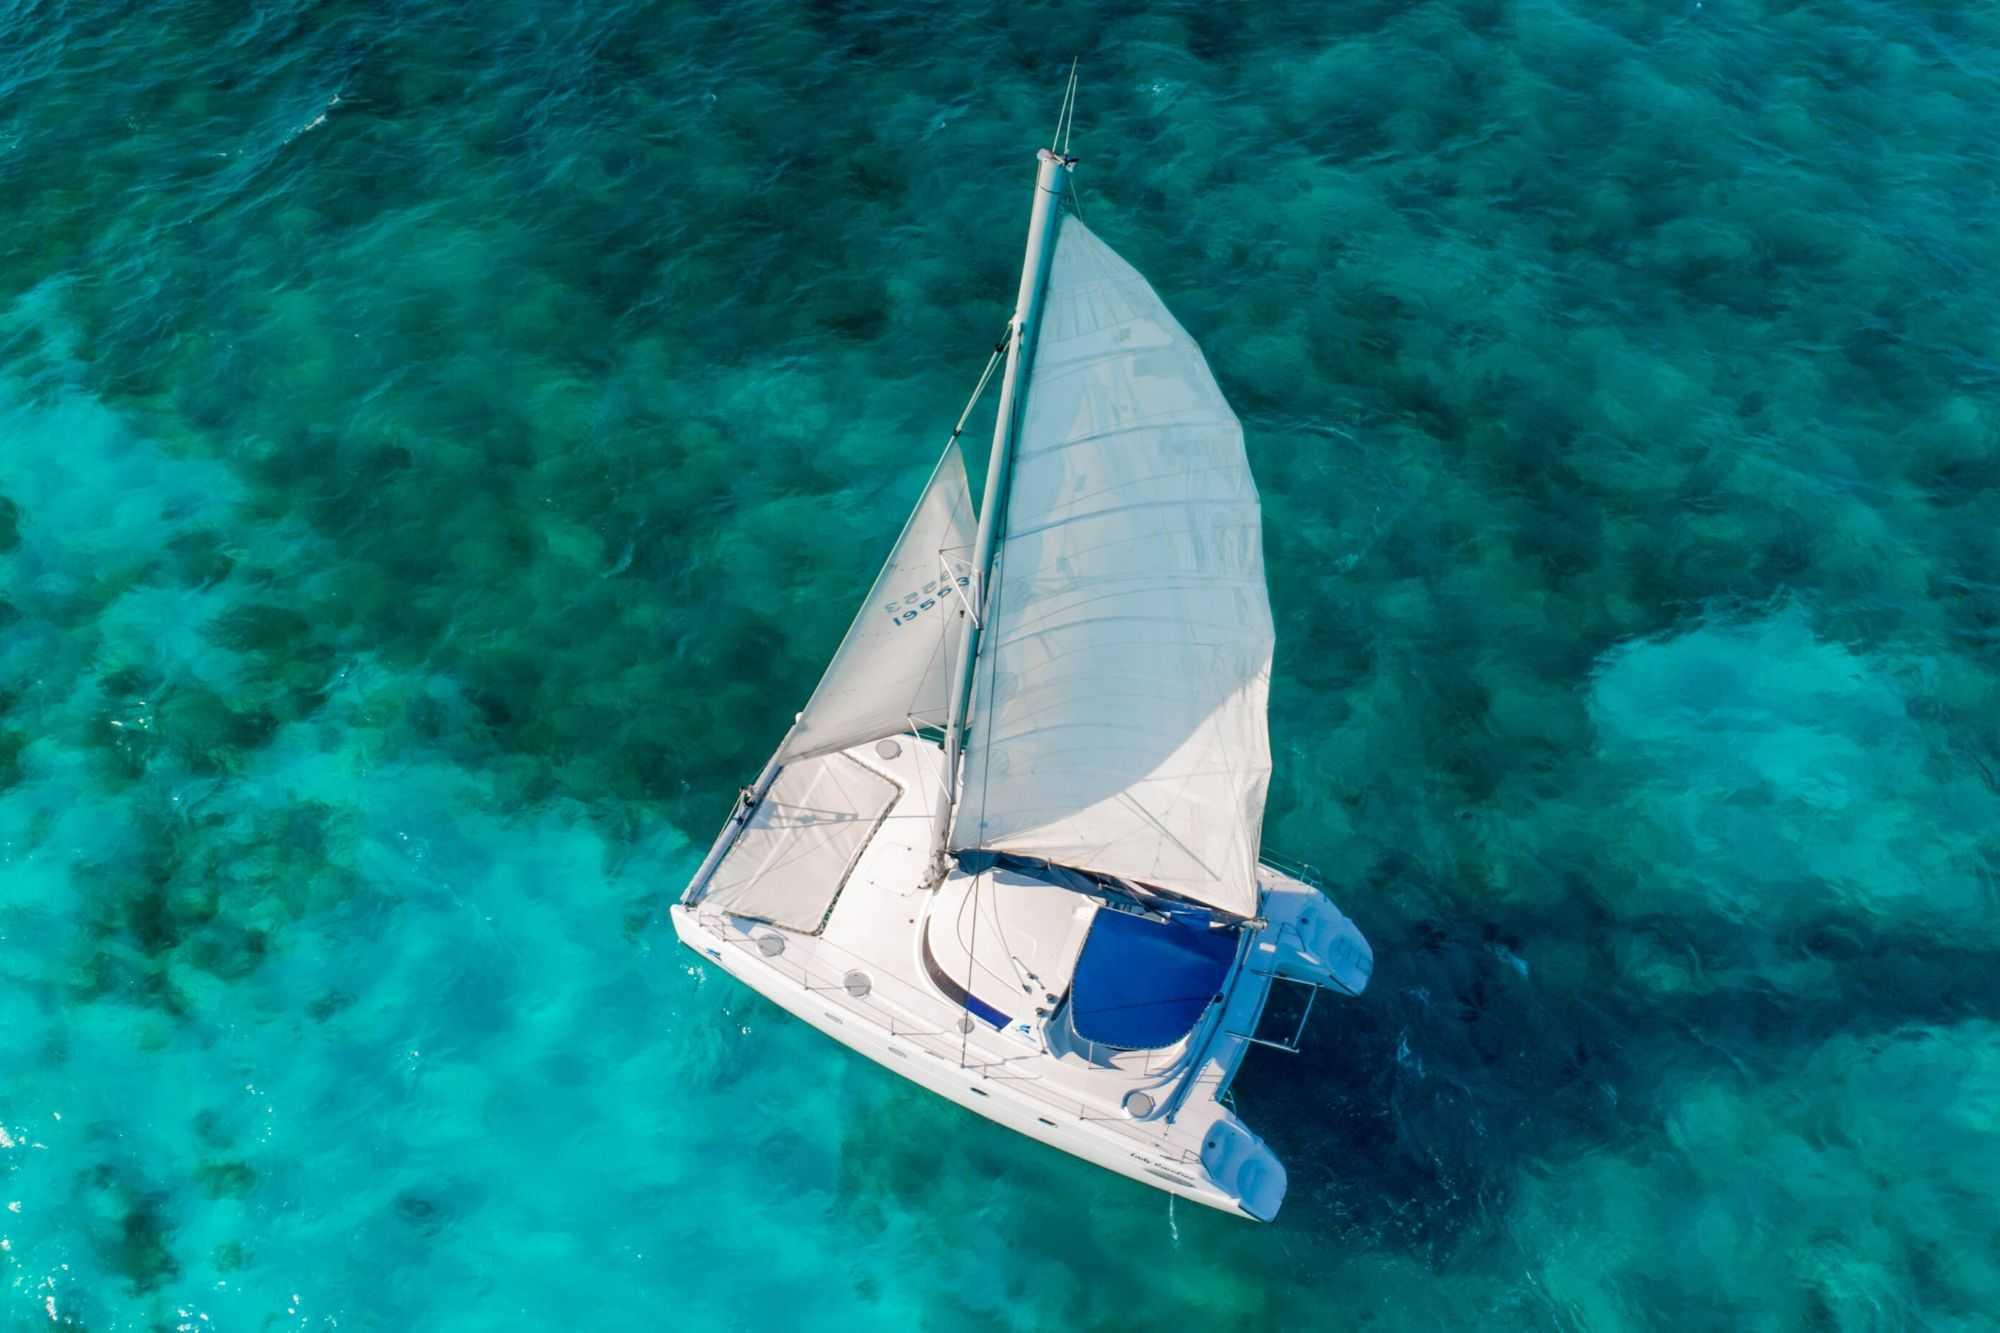 Lady Caroline - Isla Mujeres Catamaran Tour - Cancun Sailing - 8